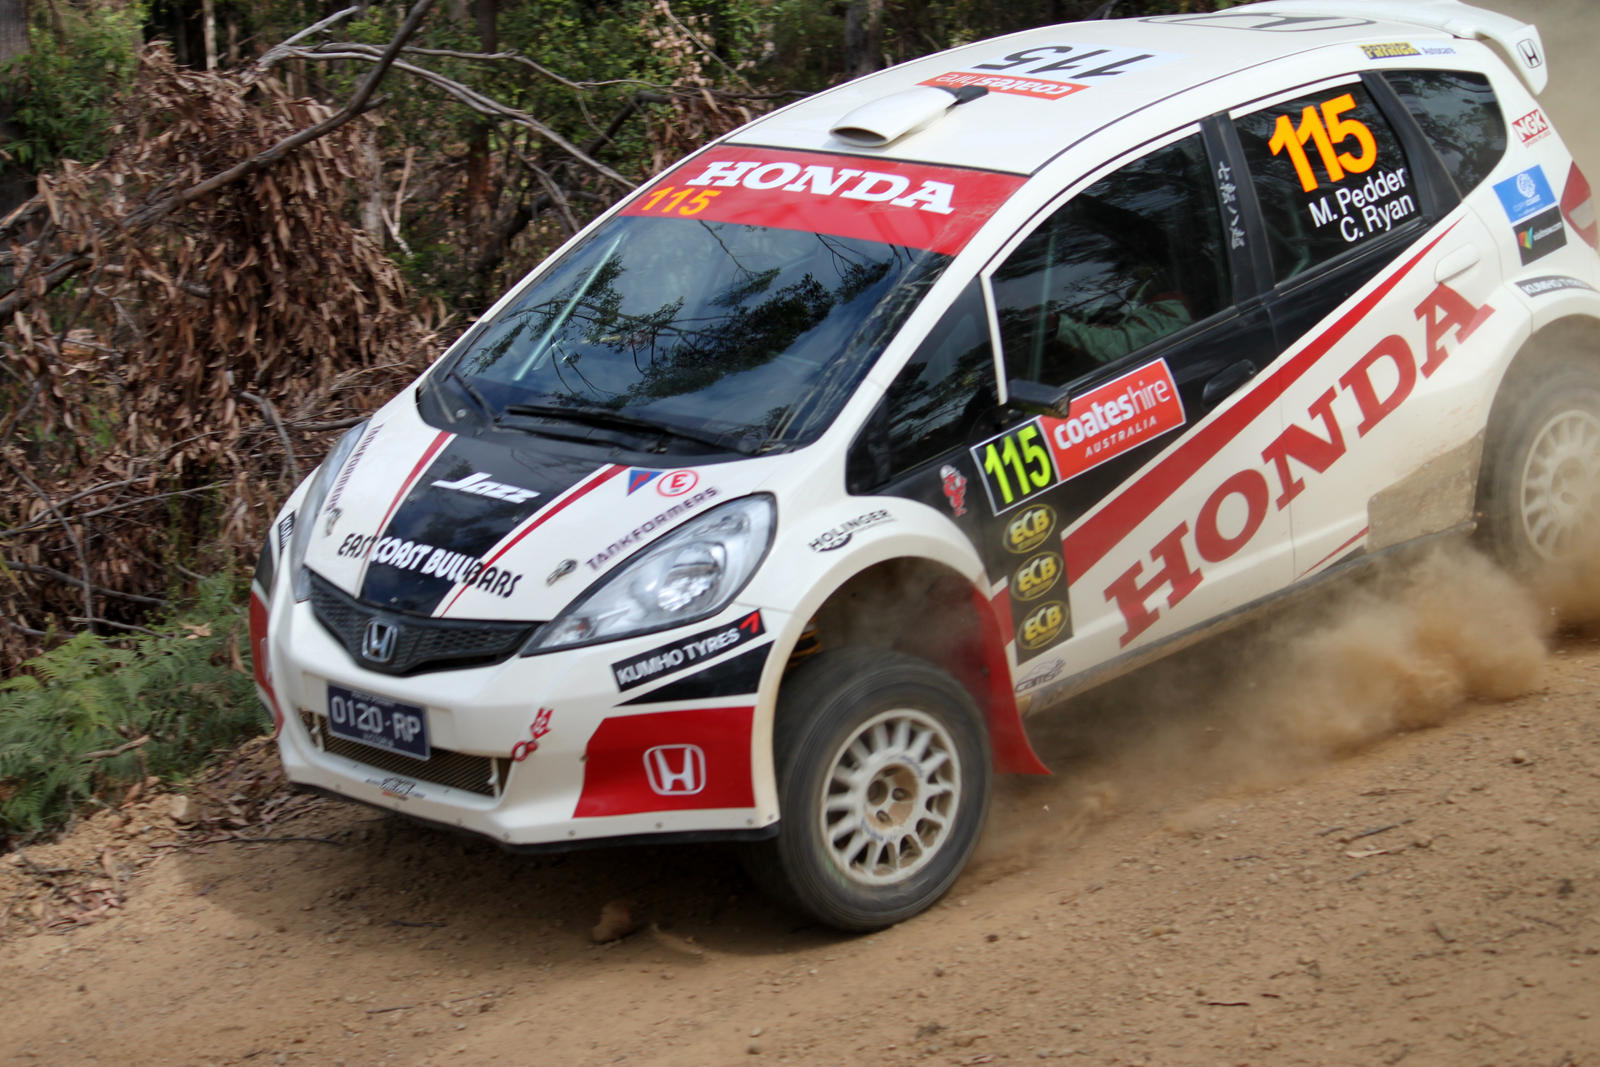 Honda Jazz Rally Australia 2013 By Tarjakart On Deviantart